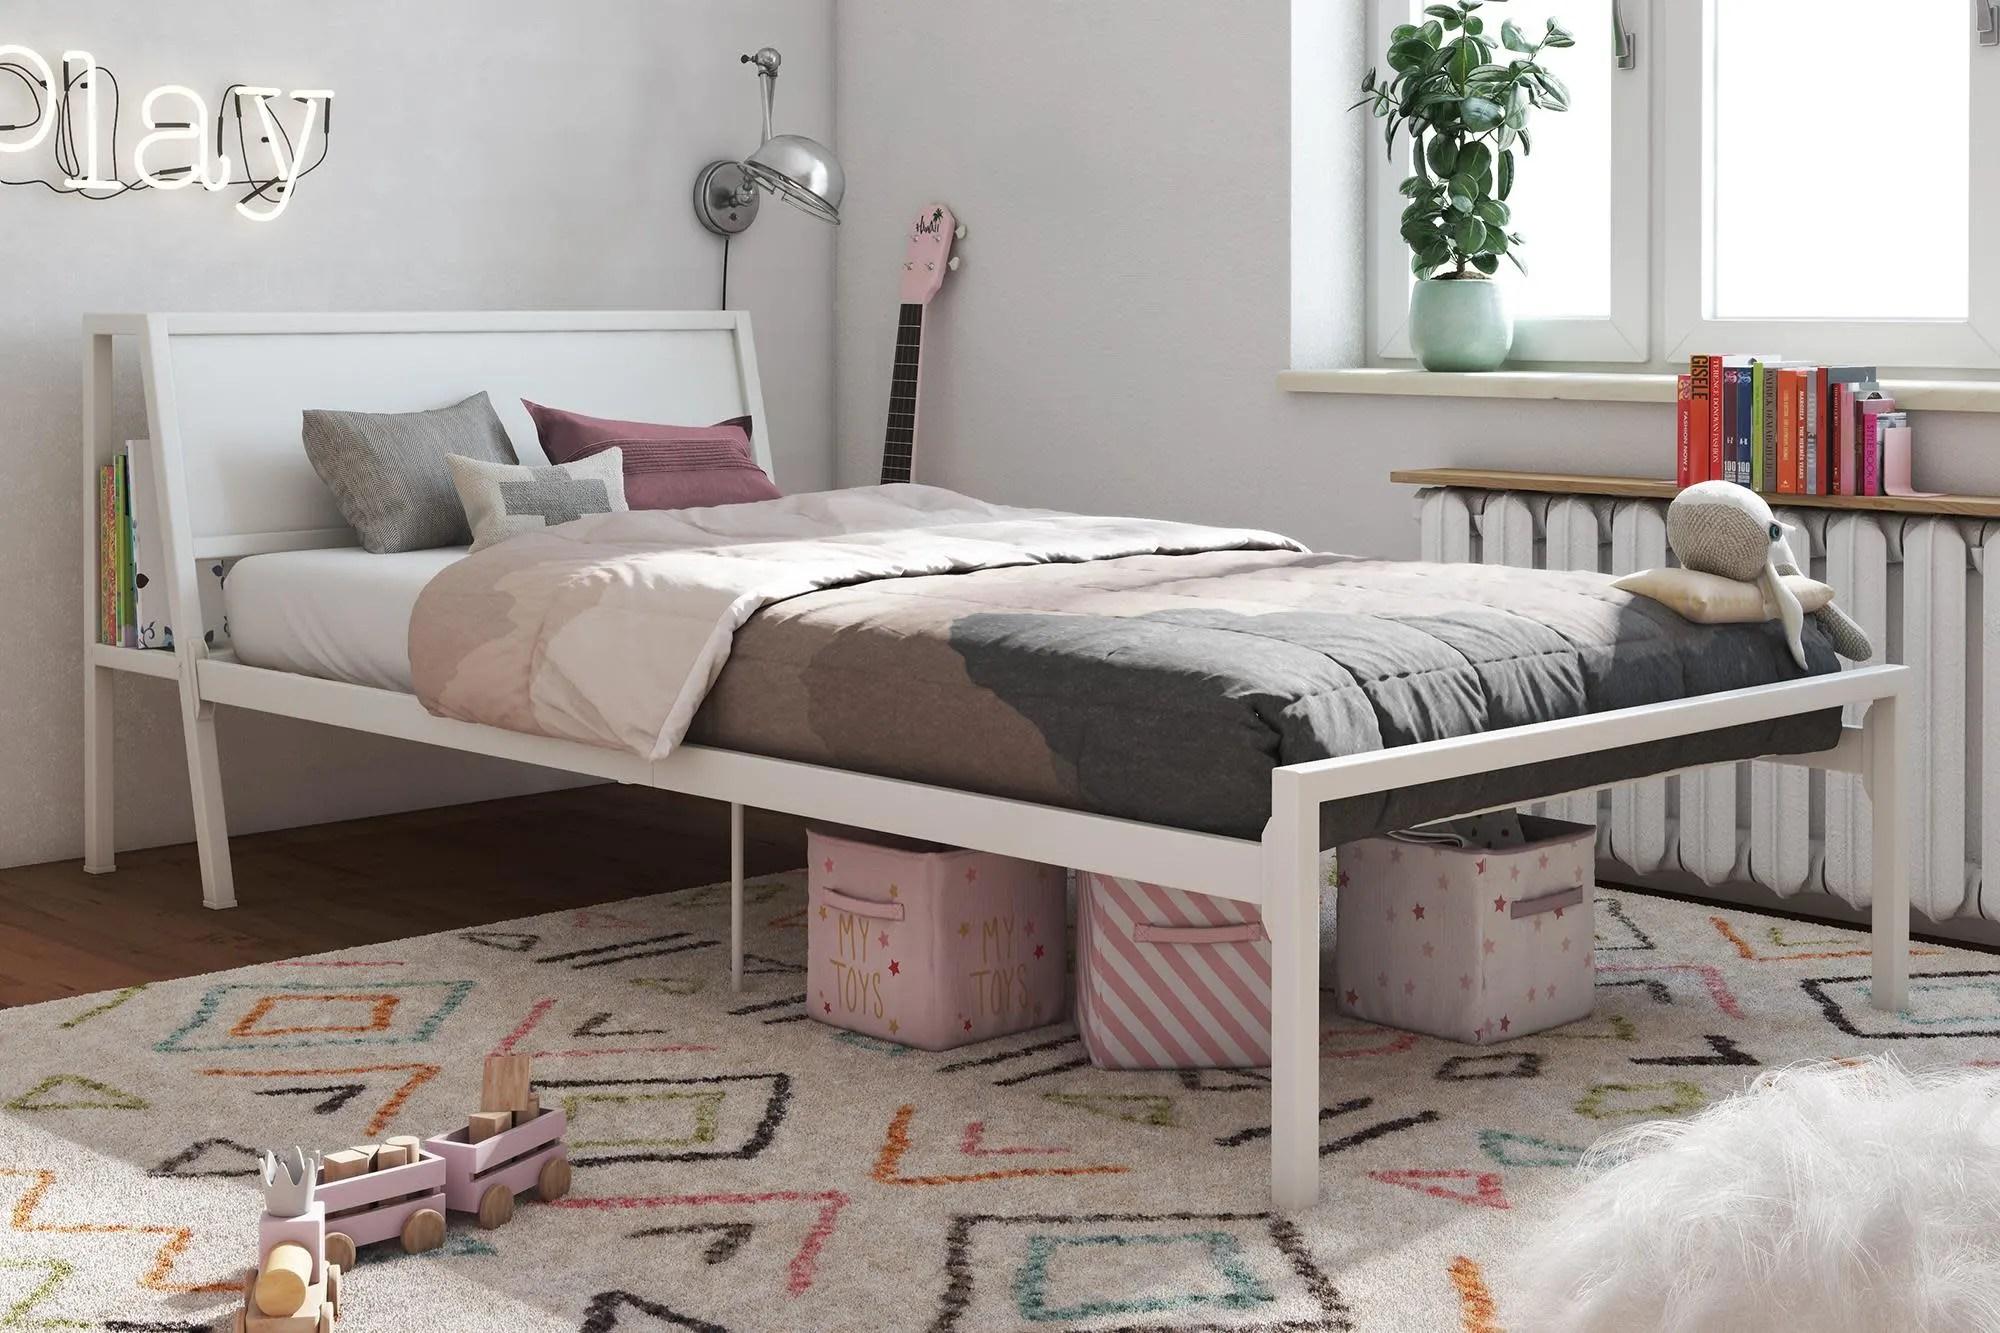 walmart furniture deals walmart funiture clearance sales on walmart bedroom furniture clearance id=71203